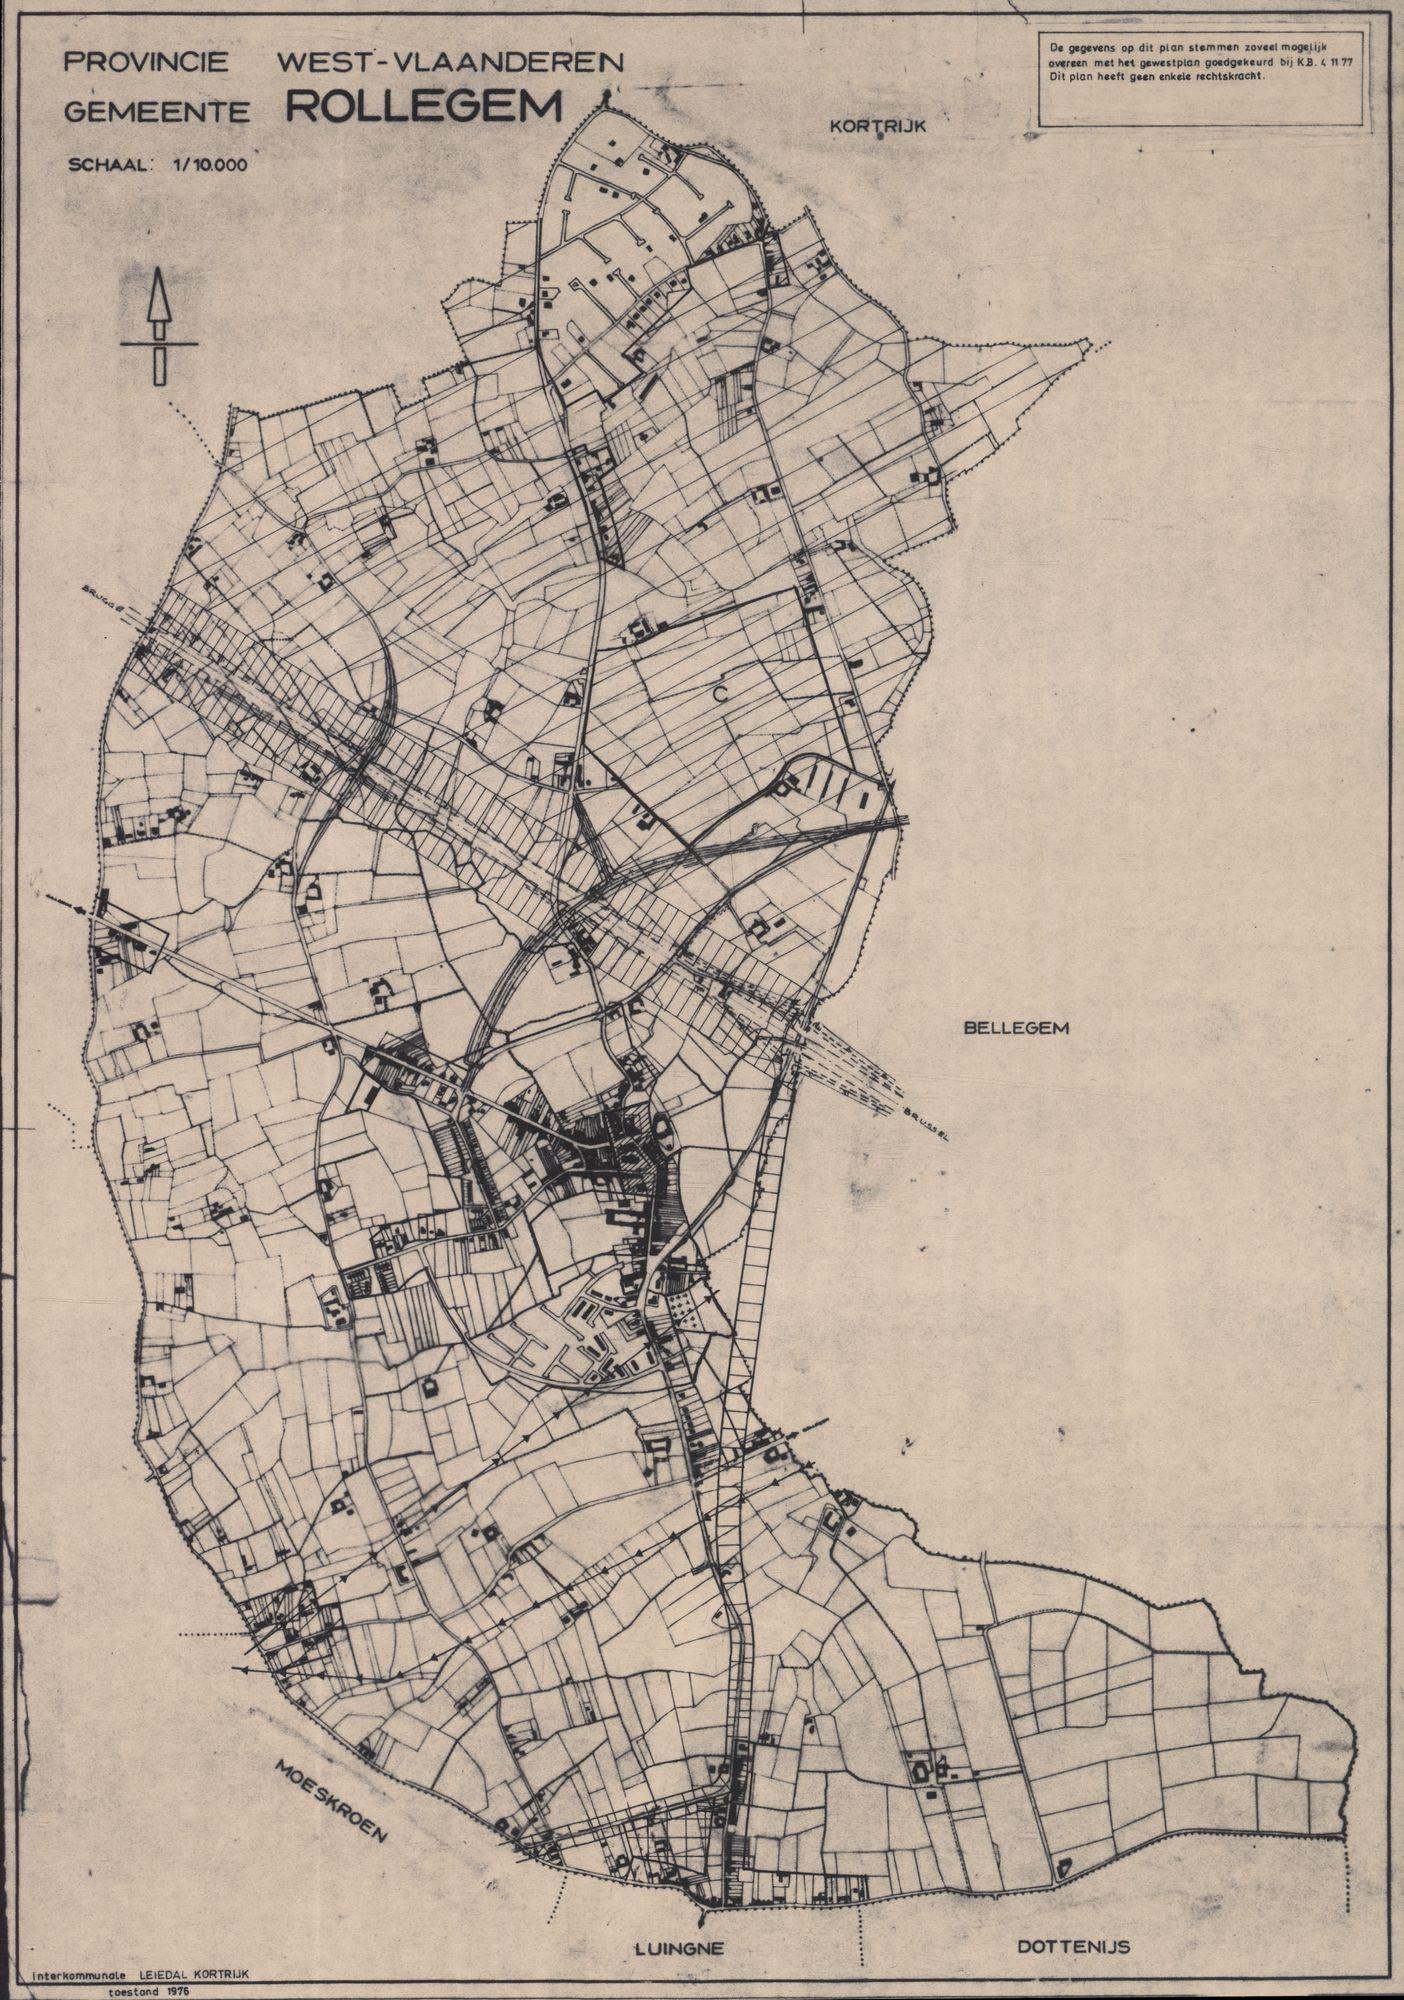 Kaarten van Heule en Omgeving m.b.t. het gewestplan, 1977